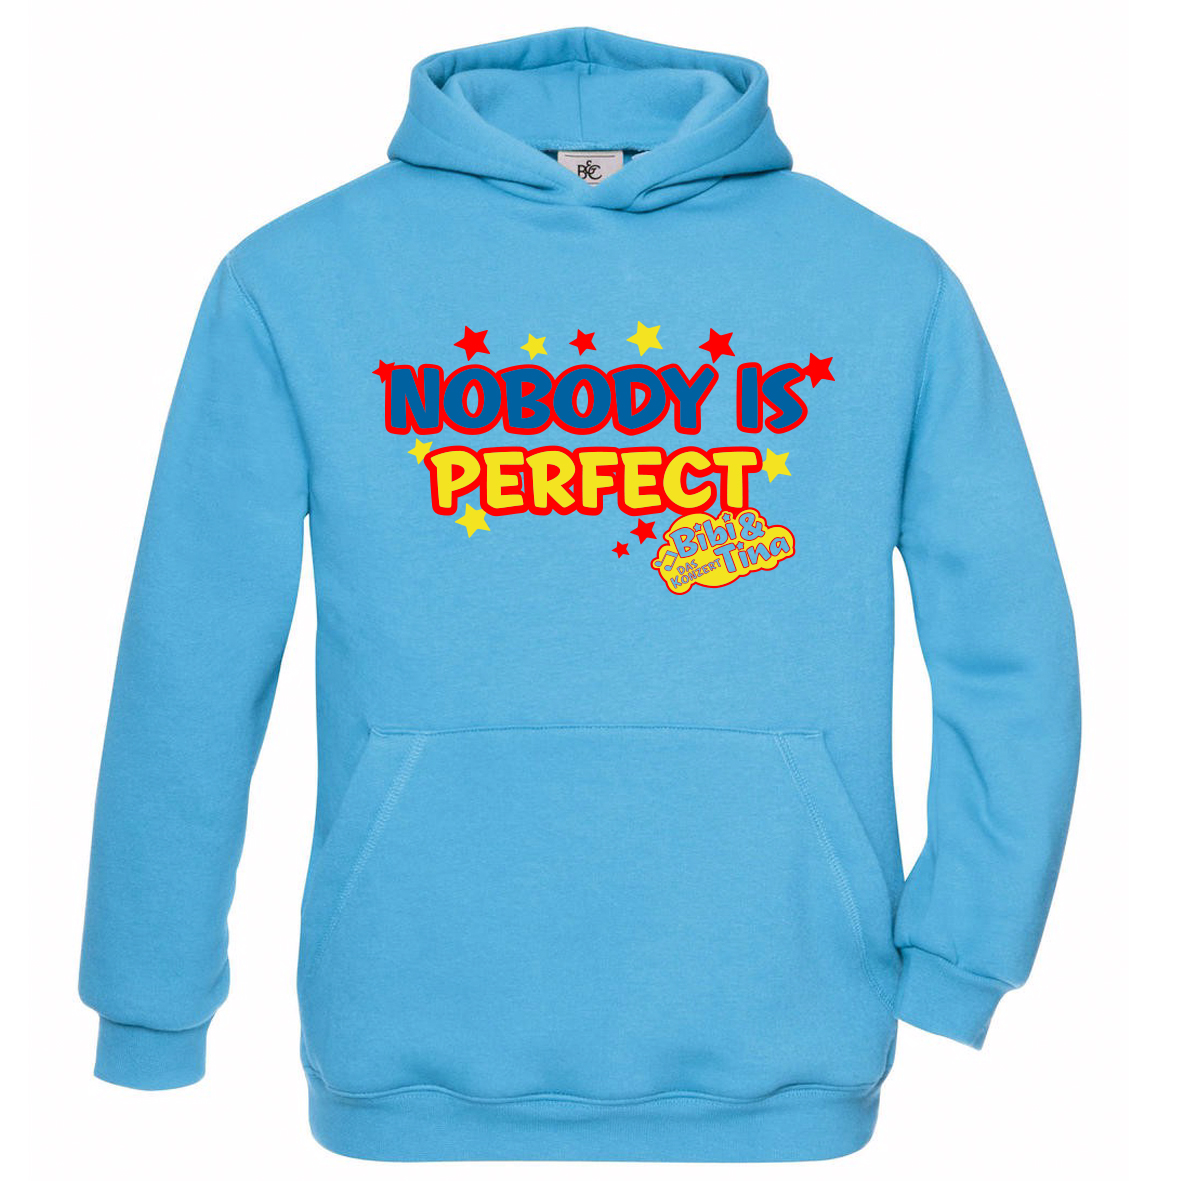 Bibi&Tina Nobody is Perfect! Hoodie, azur